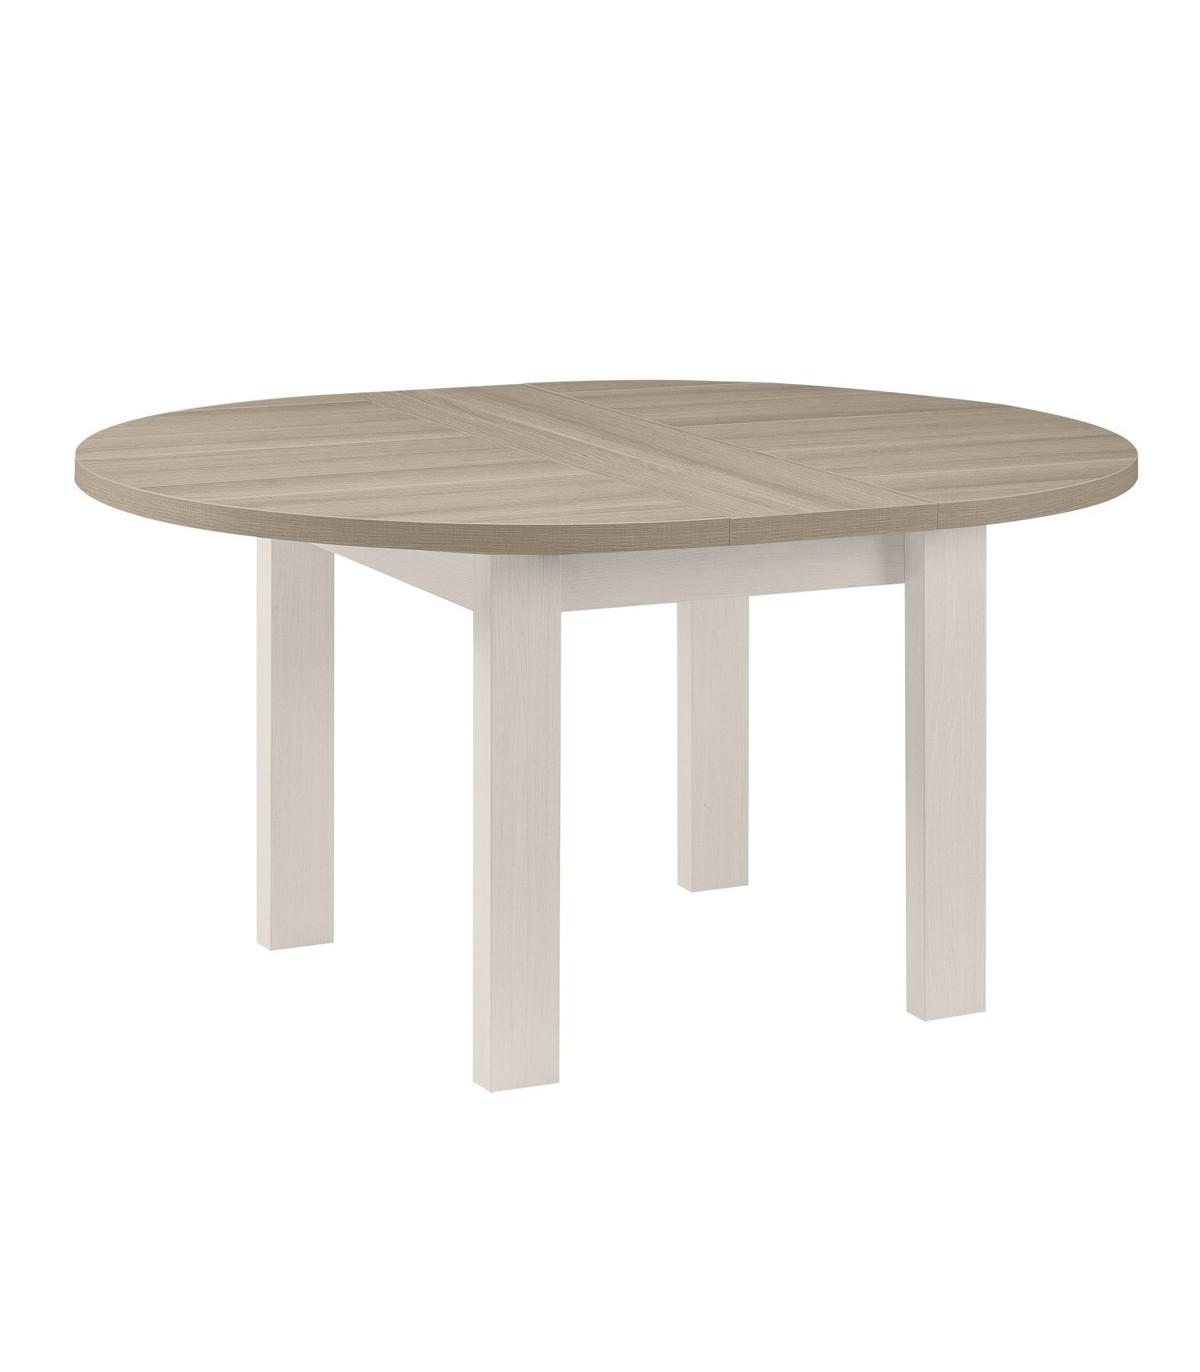 table a manger ronde avec allonge incluse fabrication francaise